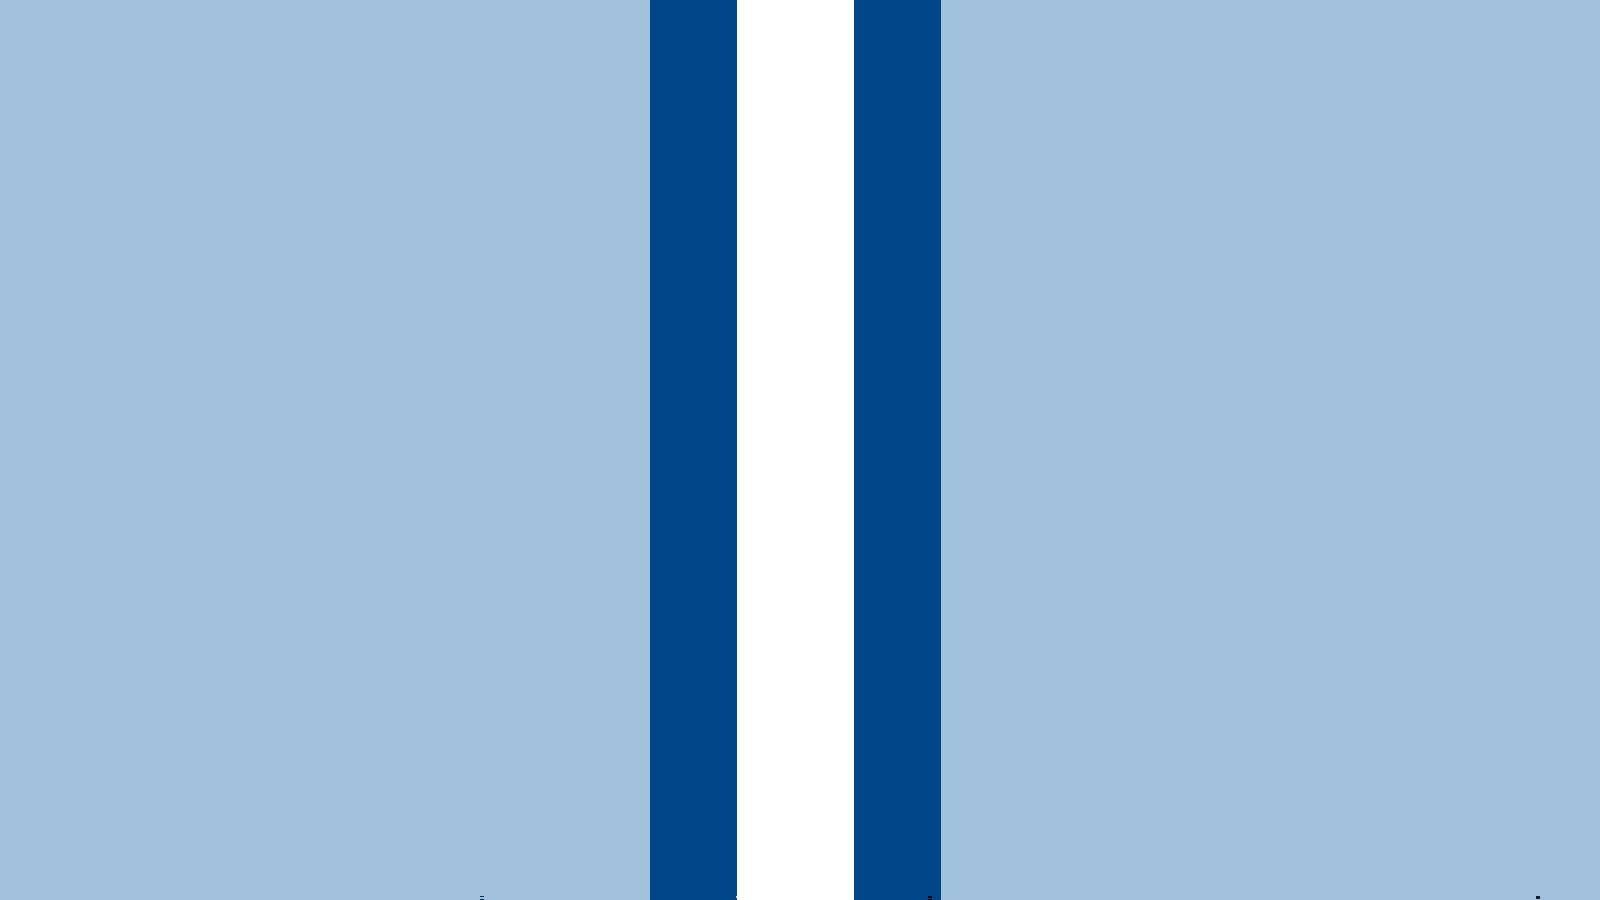 Toronto Blue Jays at Kansas City Royals